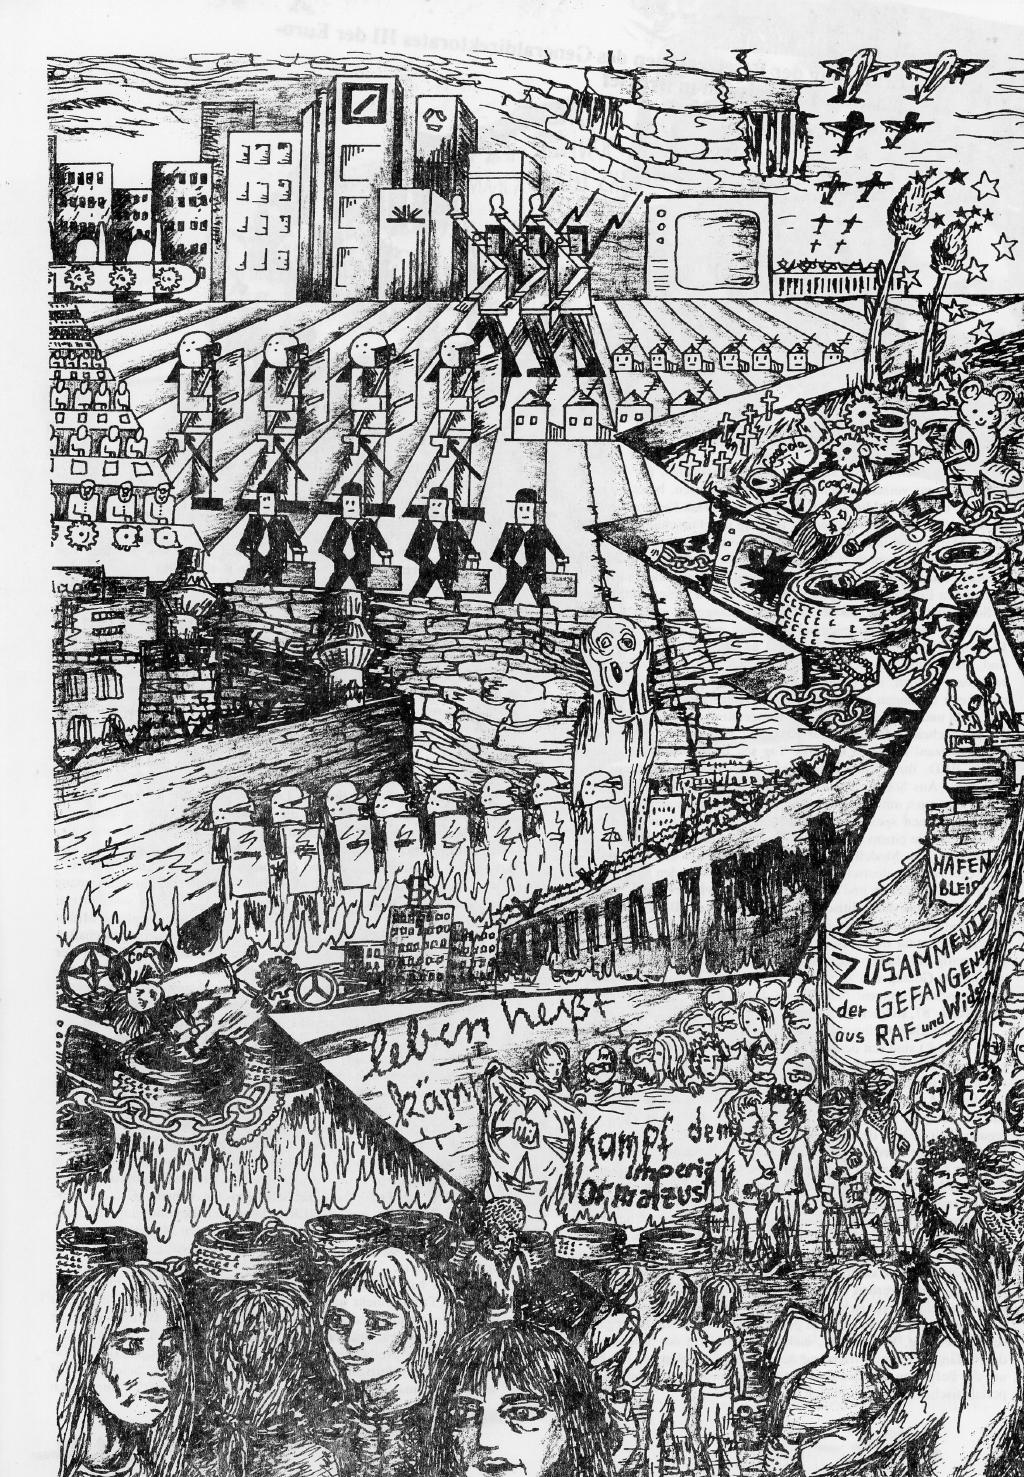 Belgien_Doku_Besetzung_EG_Kommission_1989_065